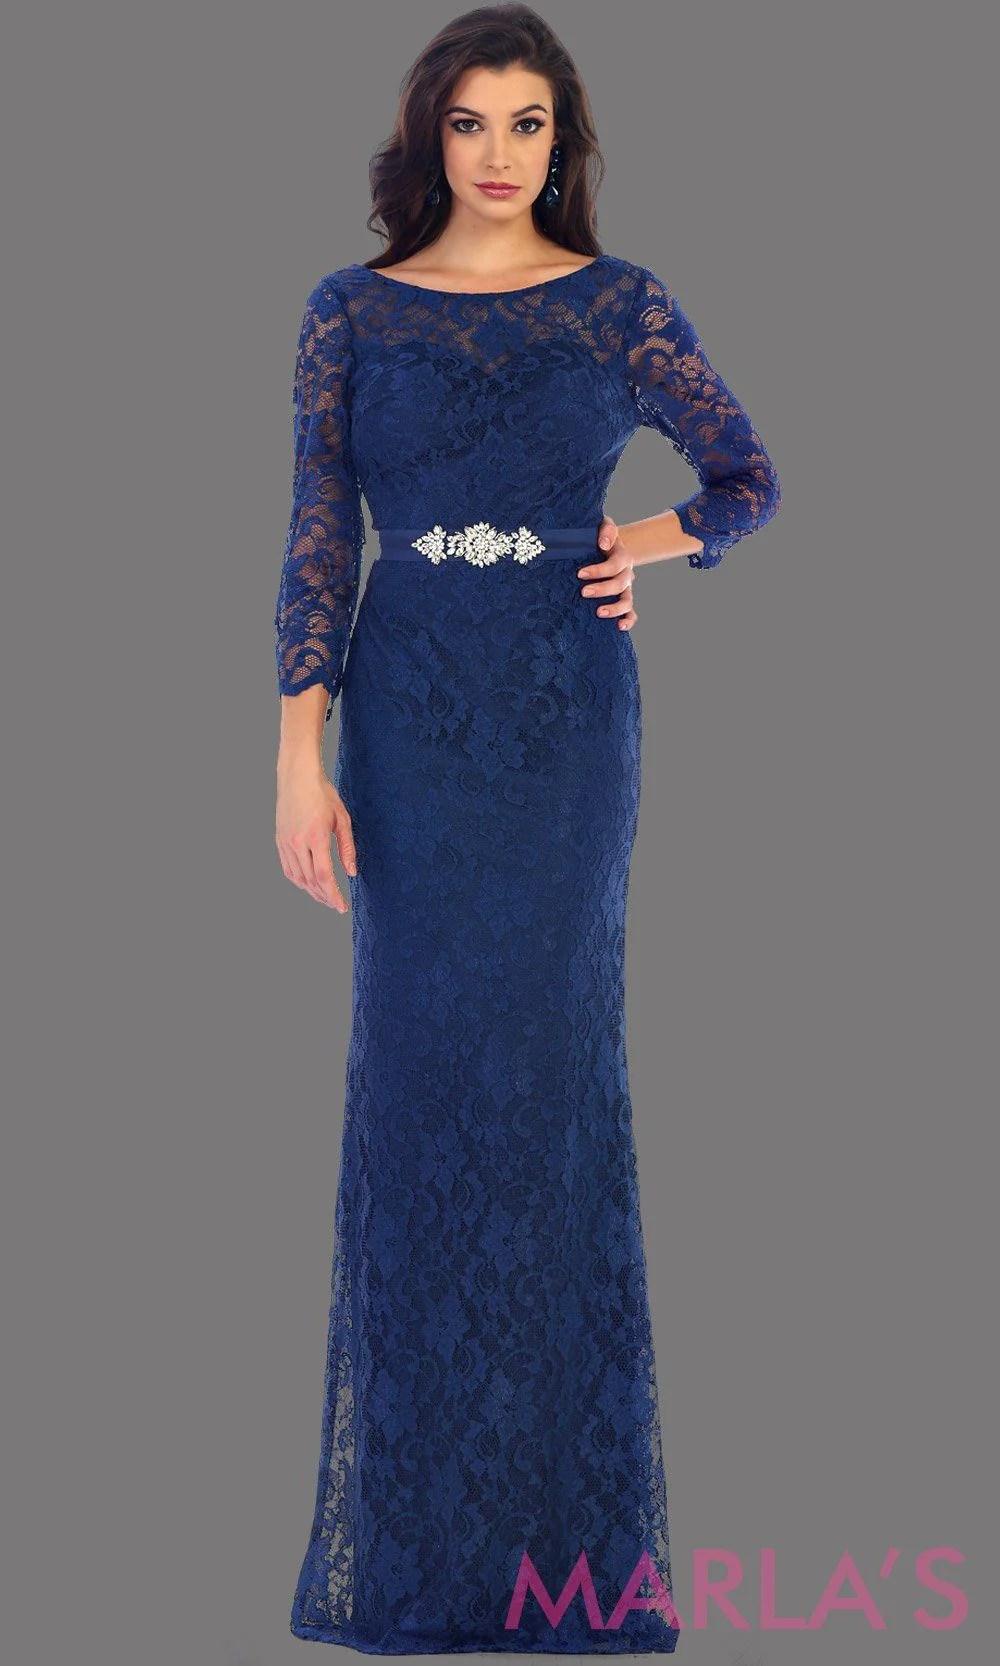 Blush Long Sleeve Lace Dress - 1454.13l Marlasfashions